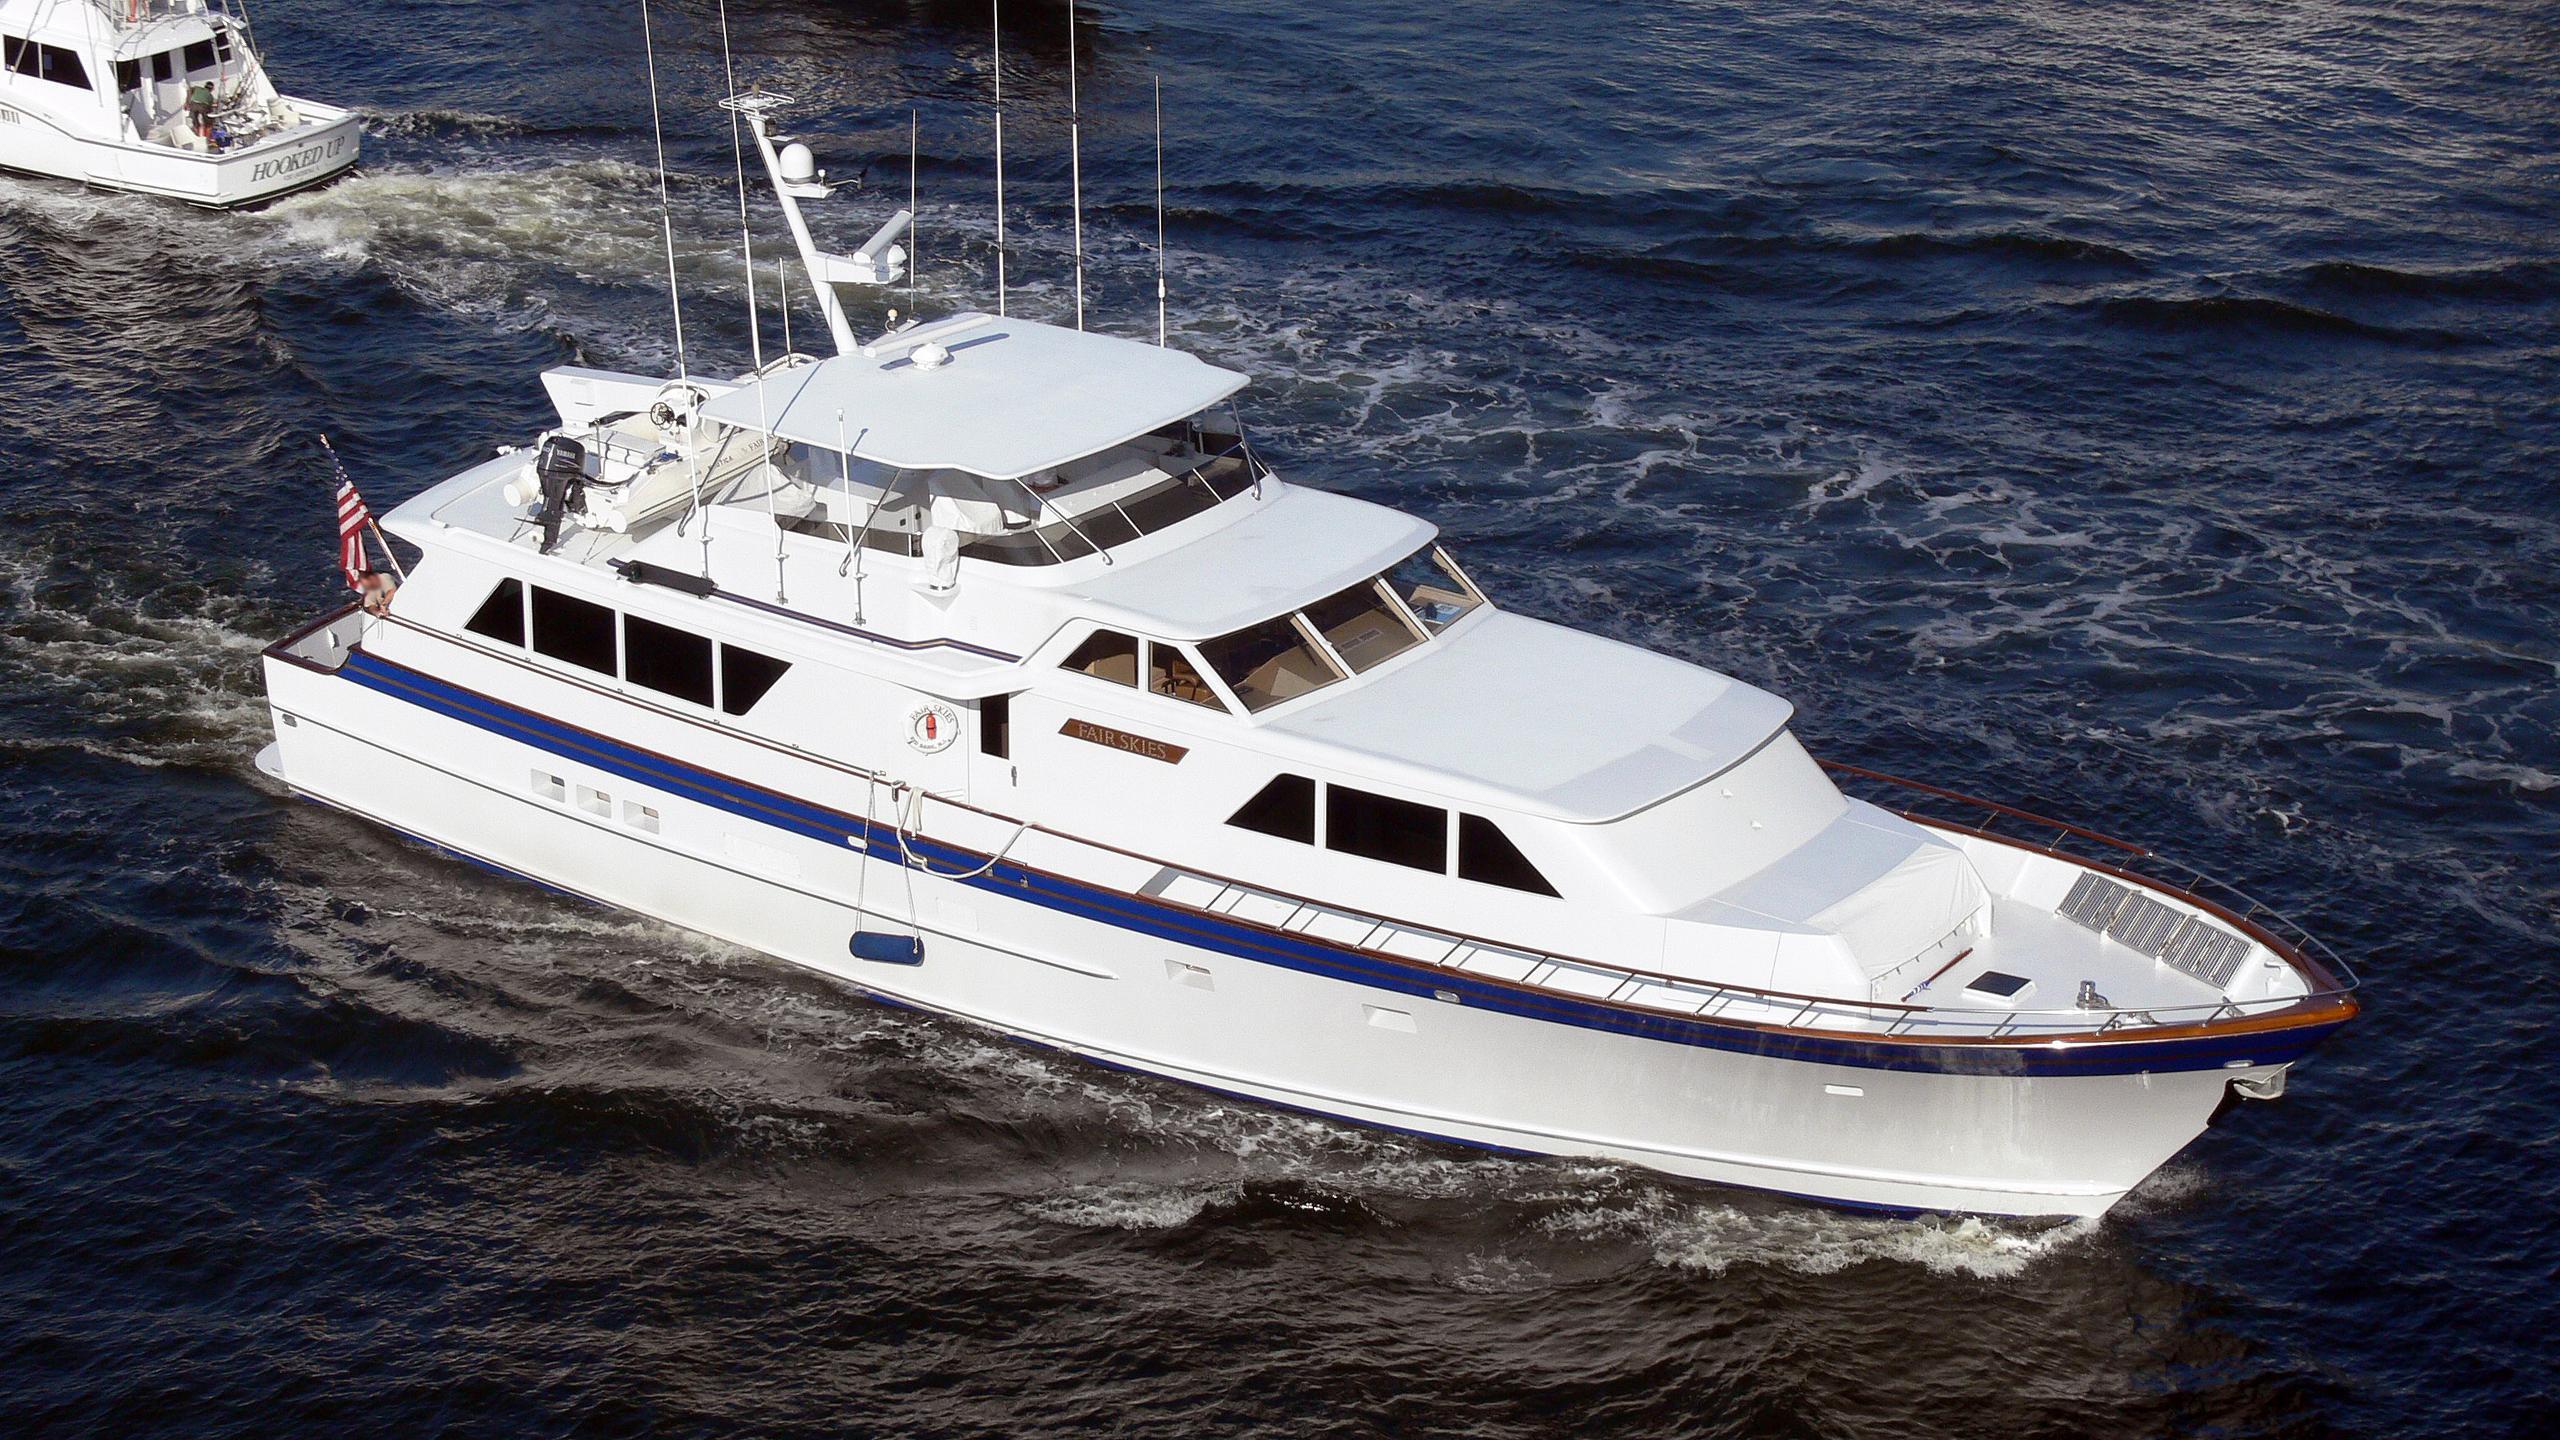 fair-skies-motor-yacht-burger-boat-1990-27m-half-profile